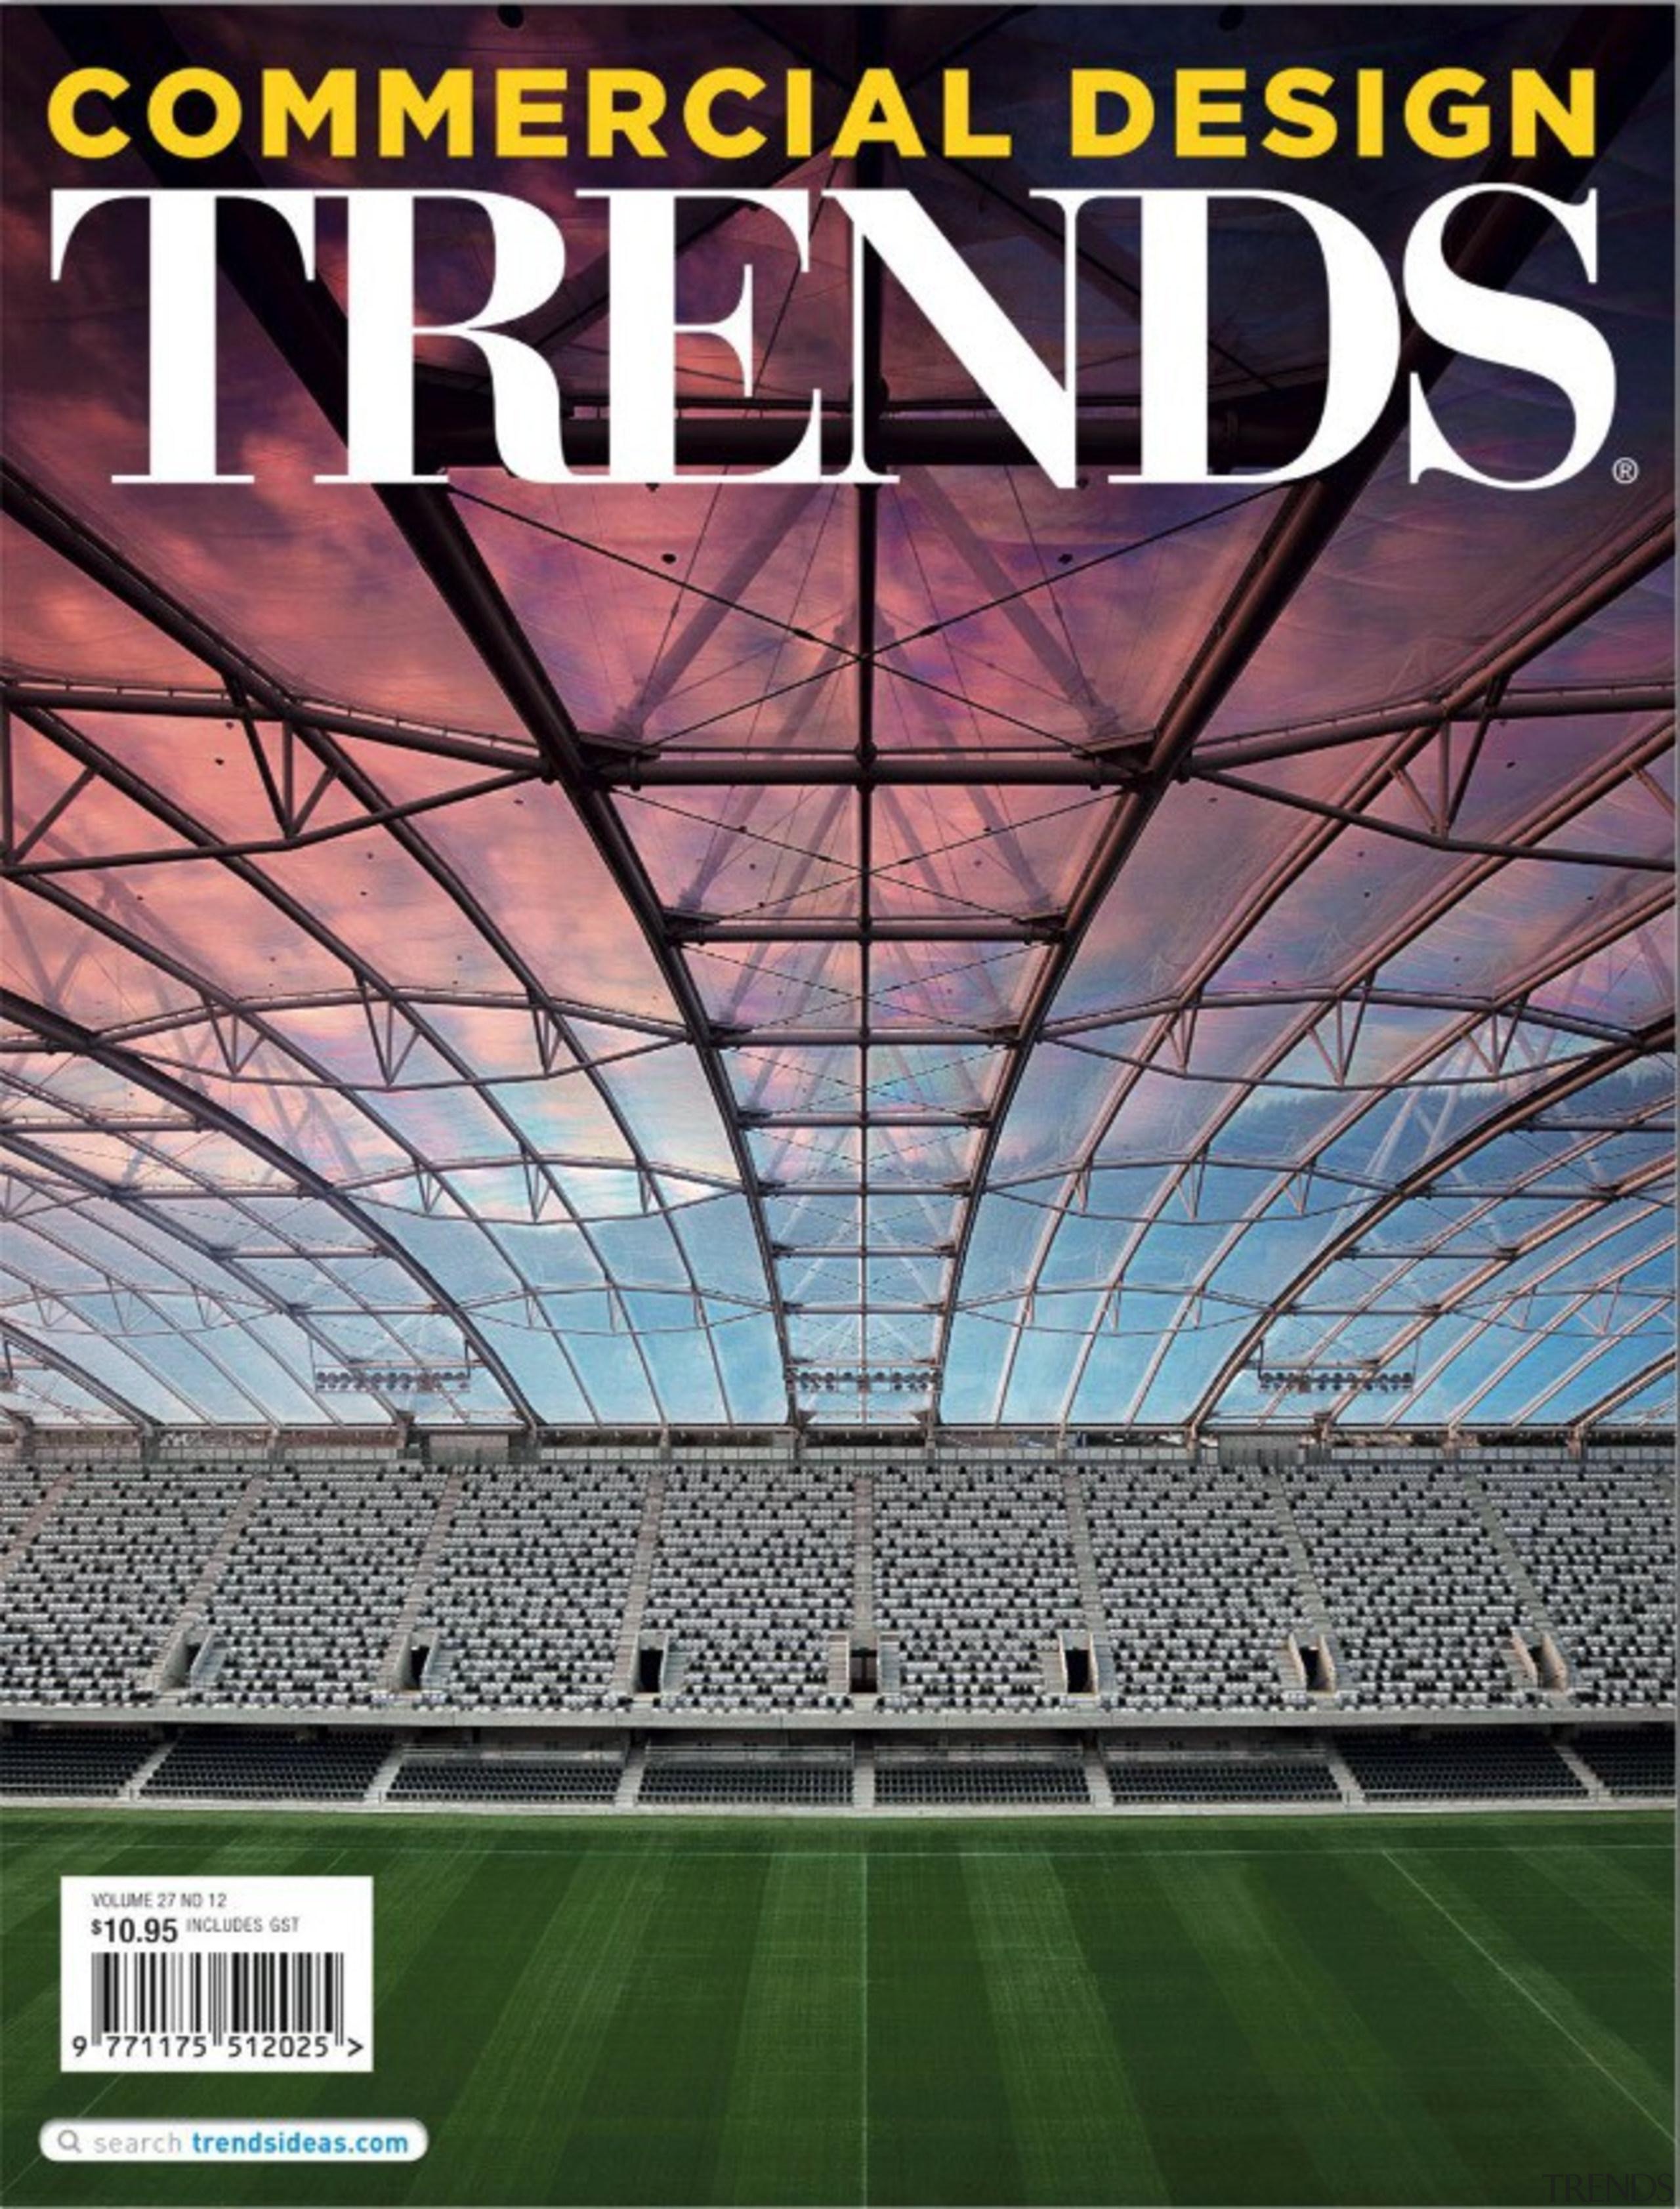 Book Cover Nz2712 - architecture   arena   architecture, arena, atmosphere, net, player, soccer specific stadium, sport venue, stadium, structure